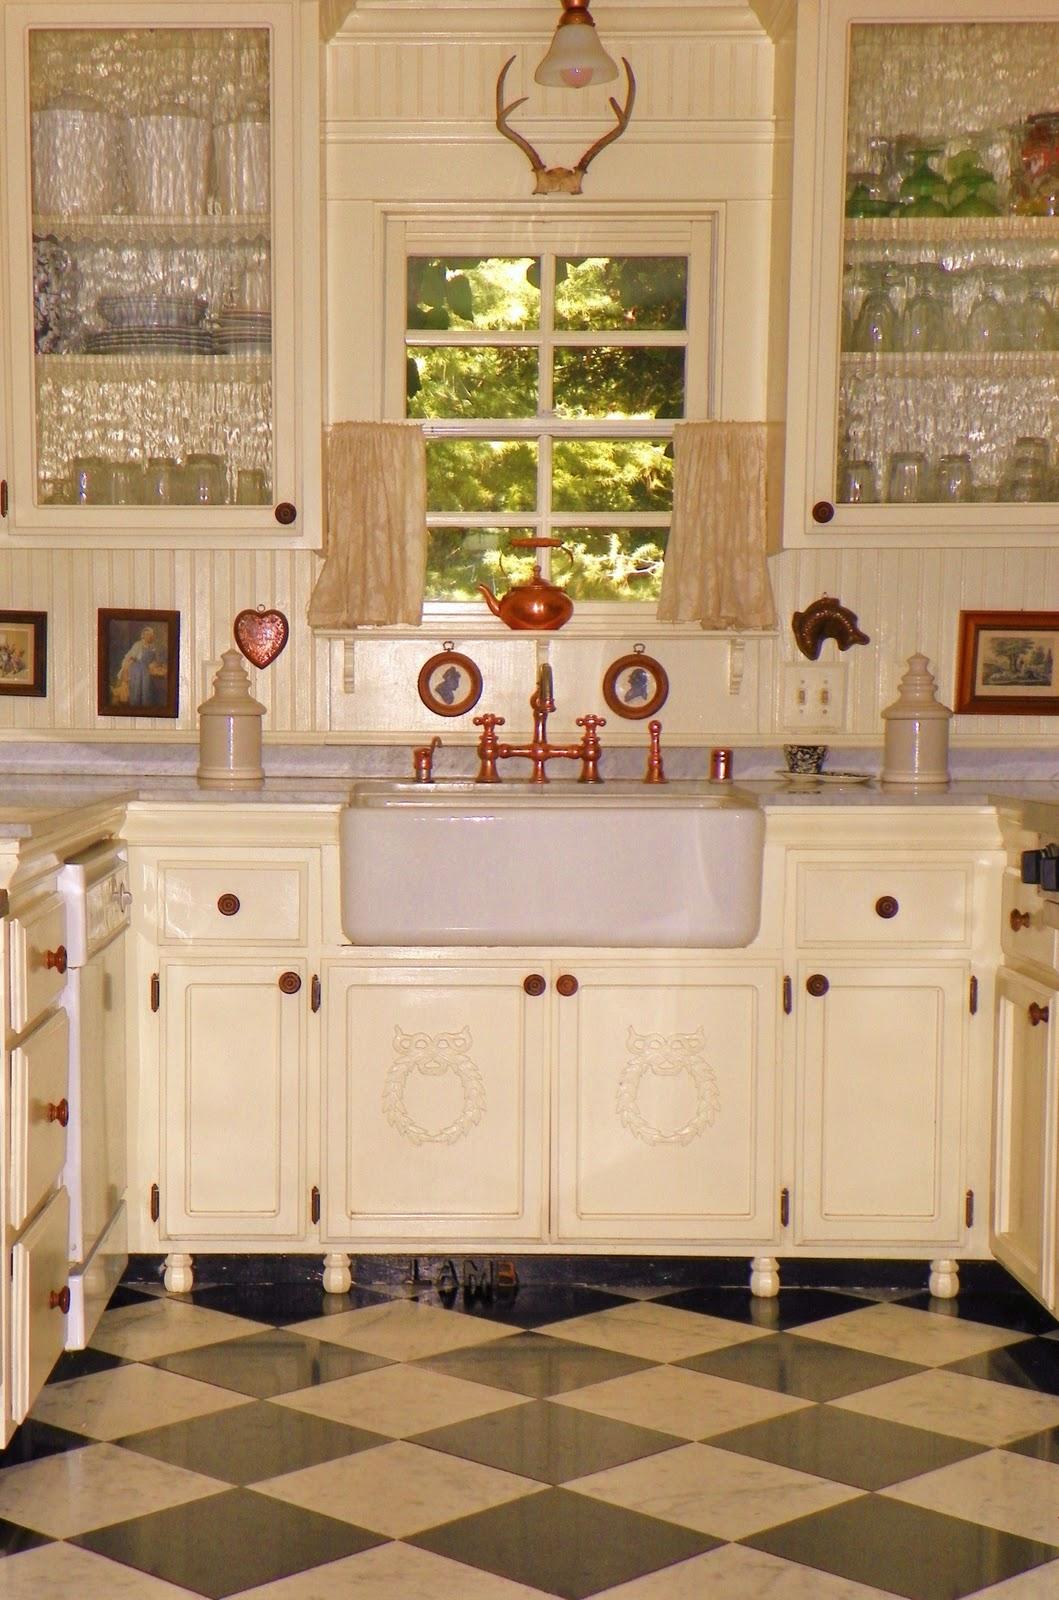 Vintage Kitchen with Farmhouse Sink